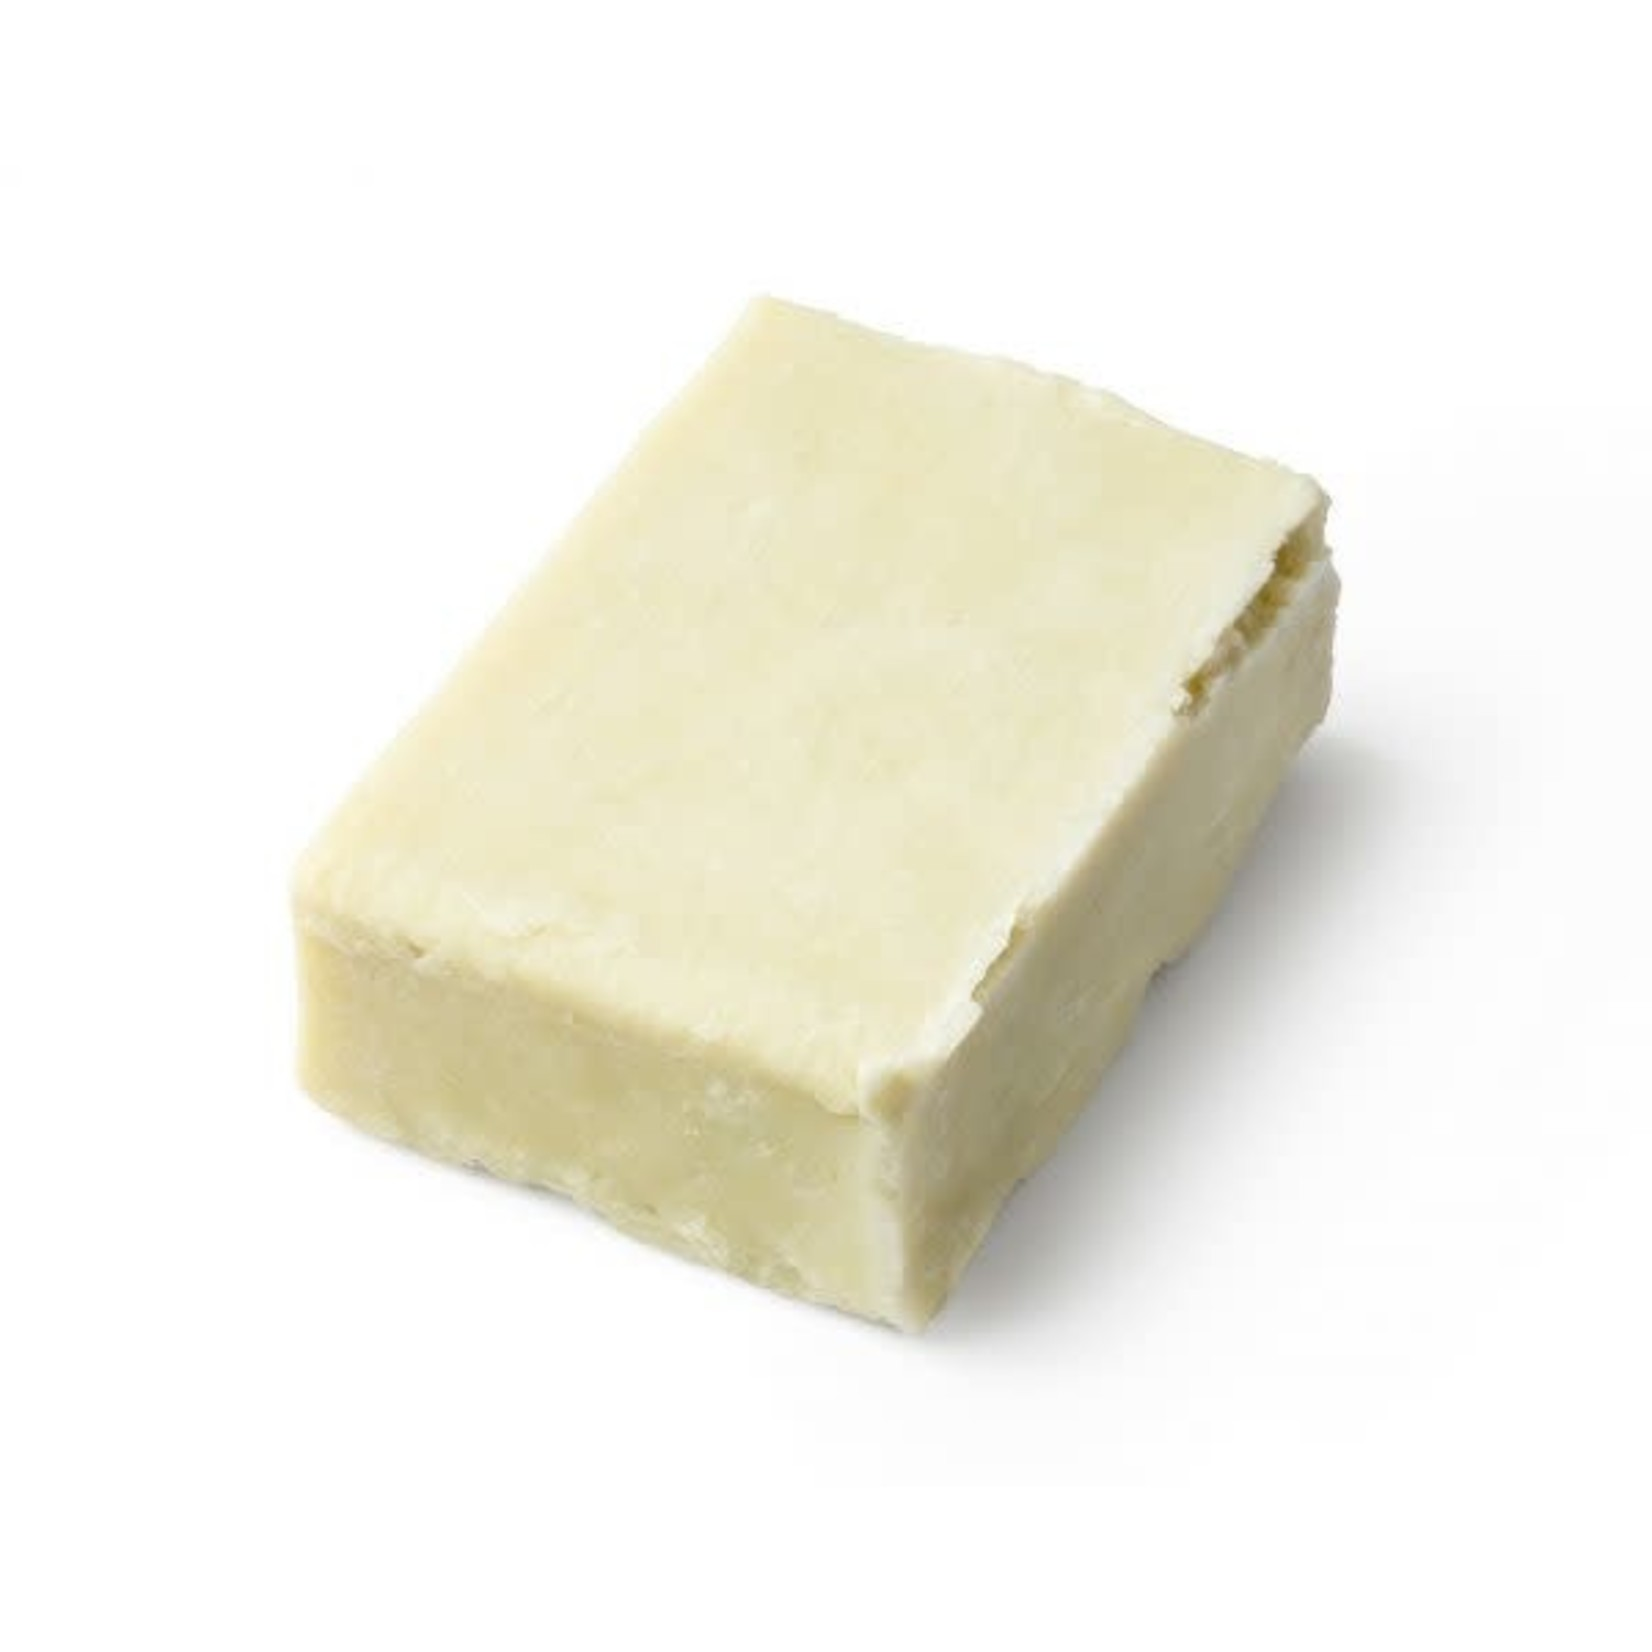 The Australian Natural Soap Company The Australian Natural Soap Company Shampoo Bar Original